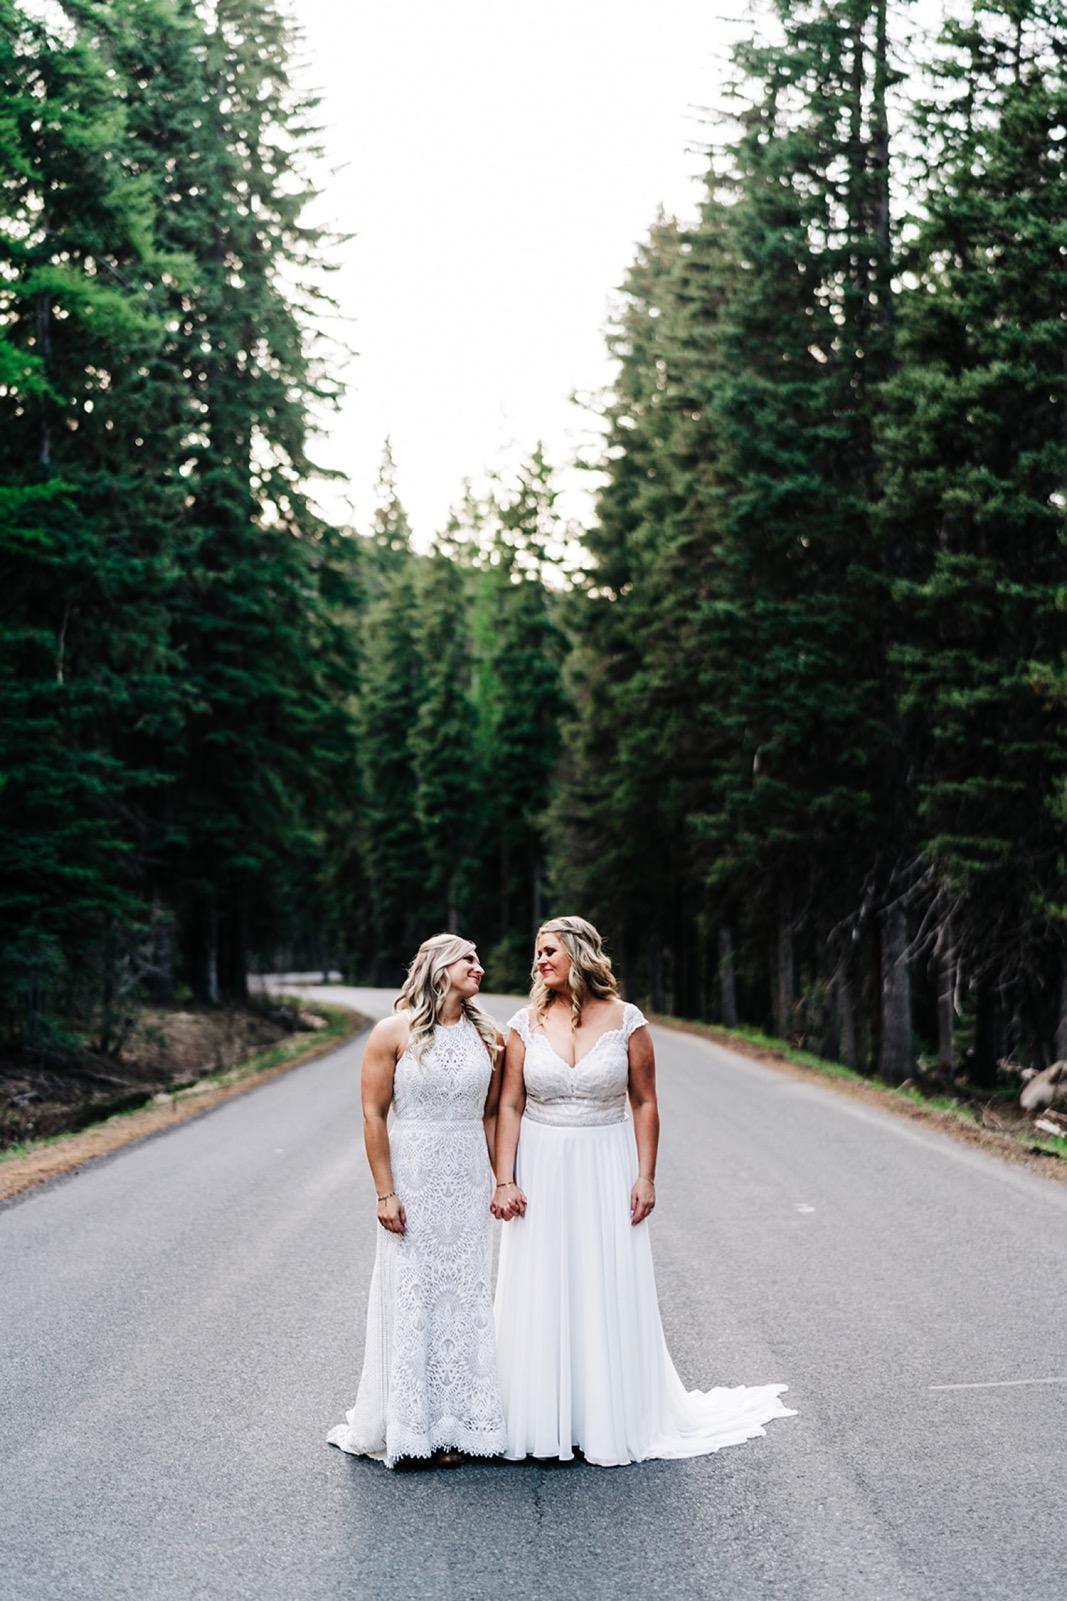 197_falissa_heather_wedding-552.jpg